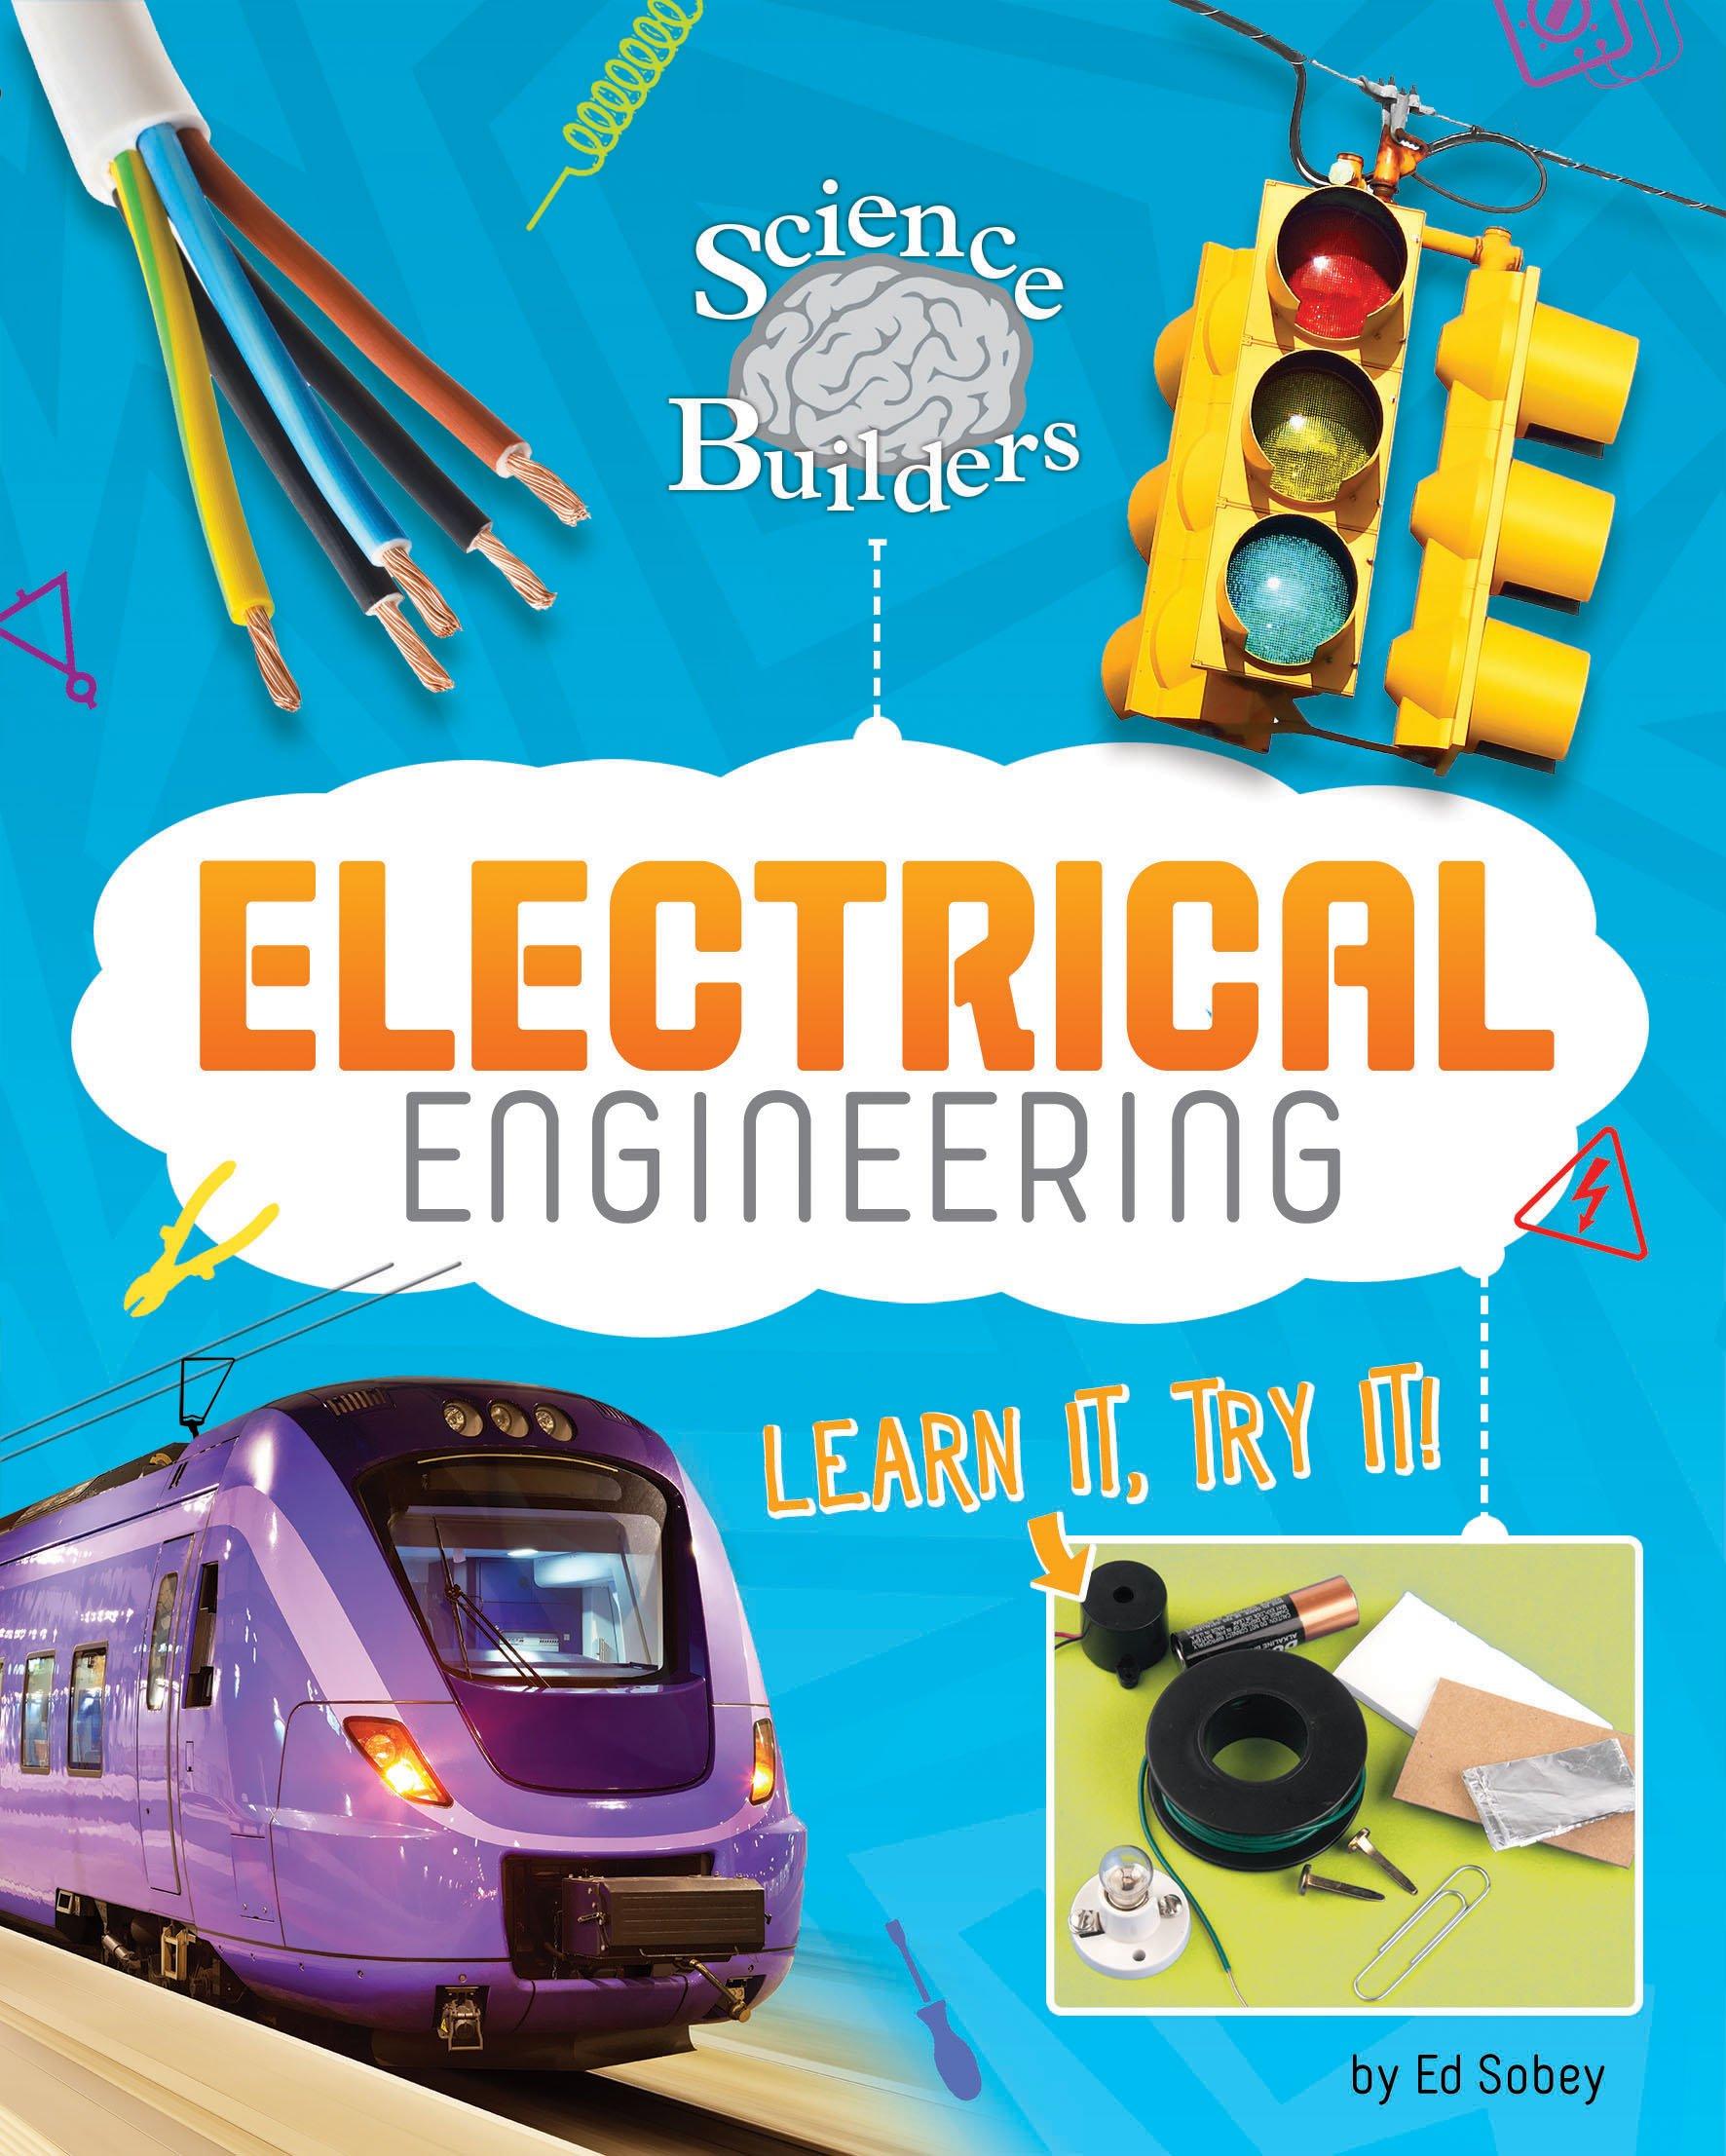 Electrical Engineering: Learn It, Try It! (Science Brain Builders) ebook